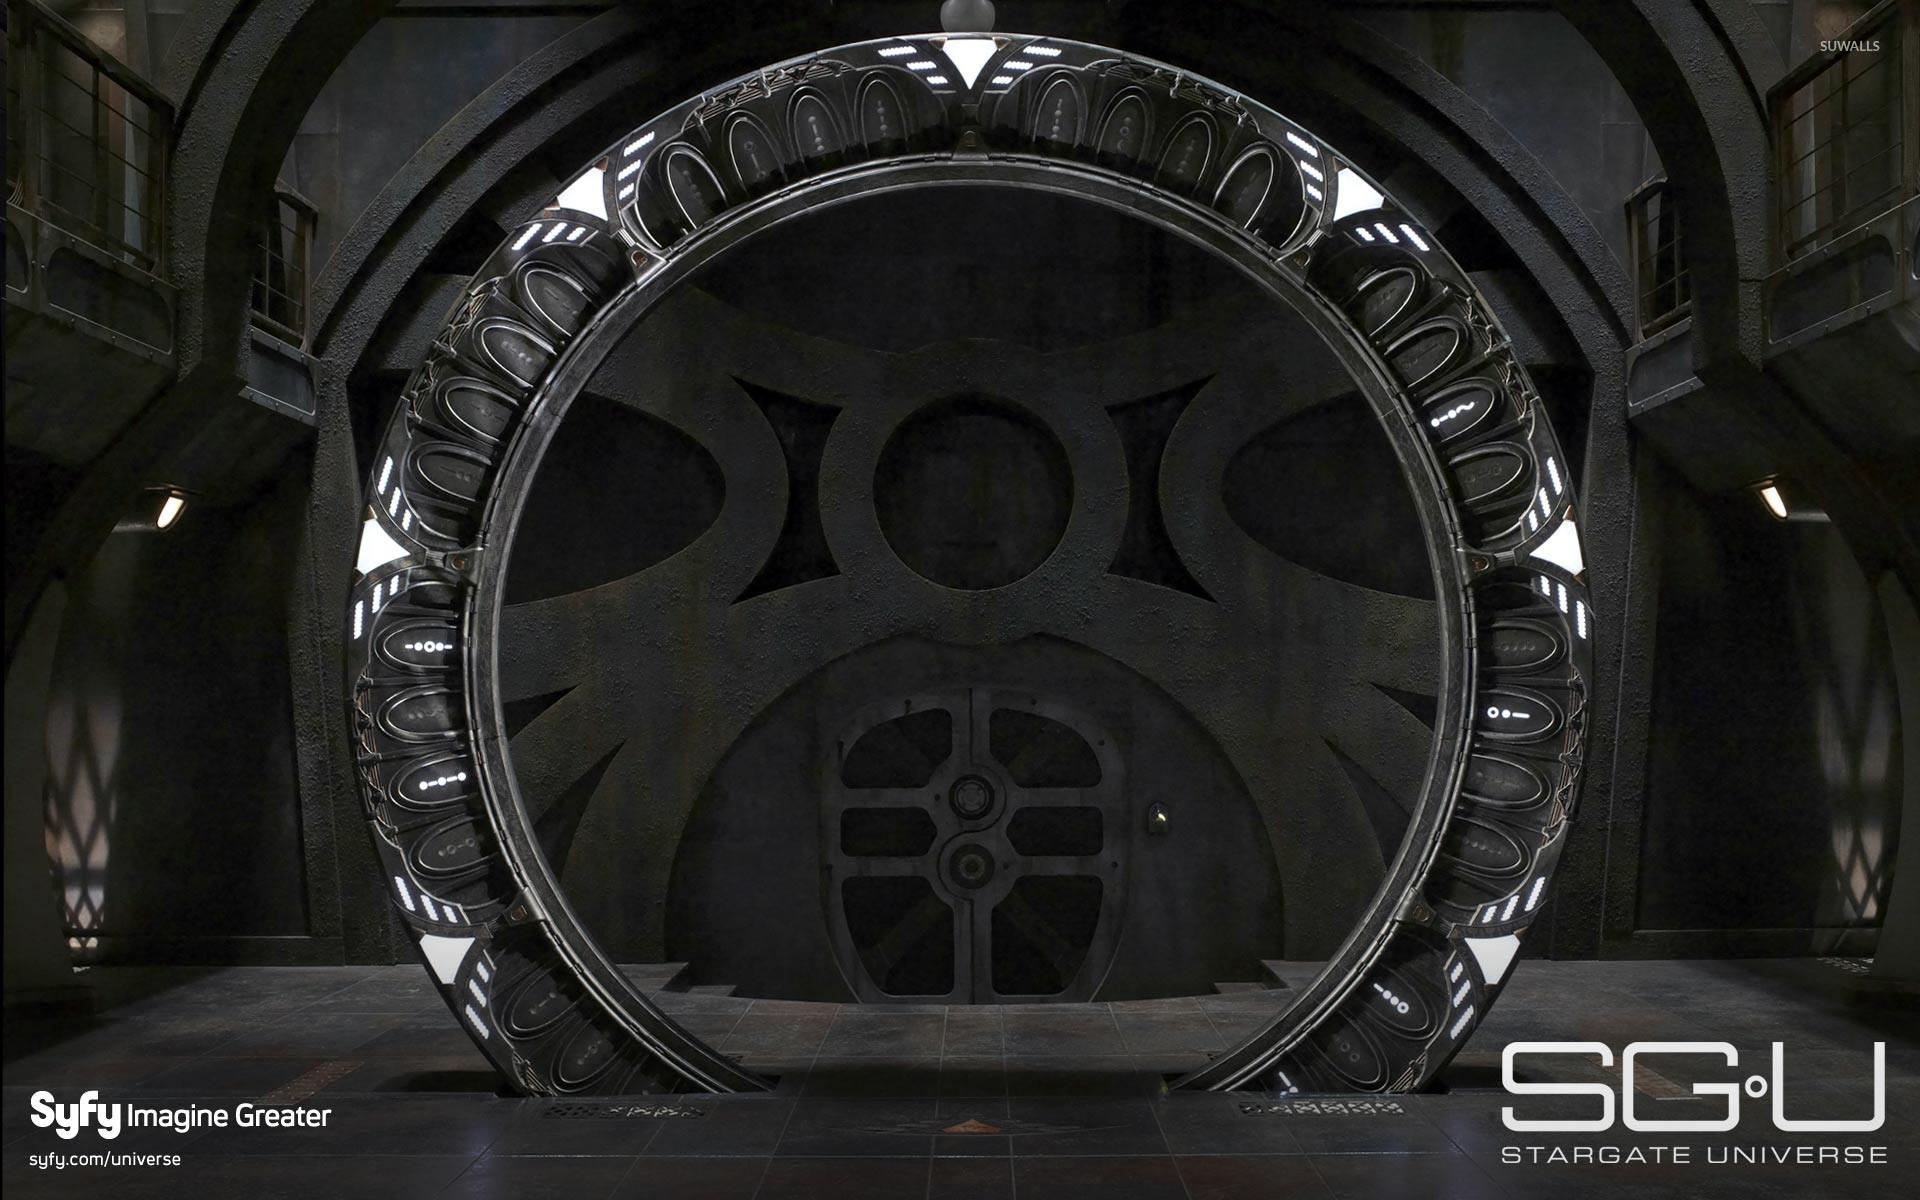 Stargate Universe wallpaper - TV Show